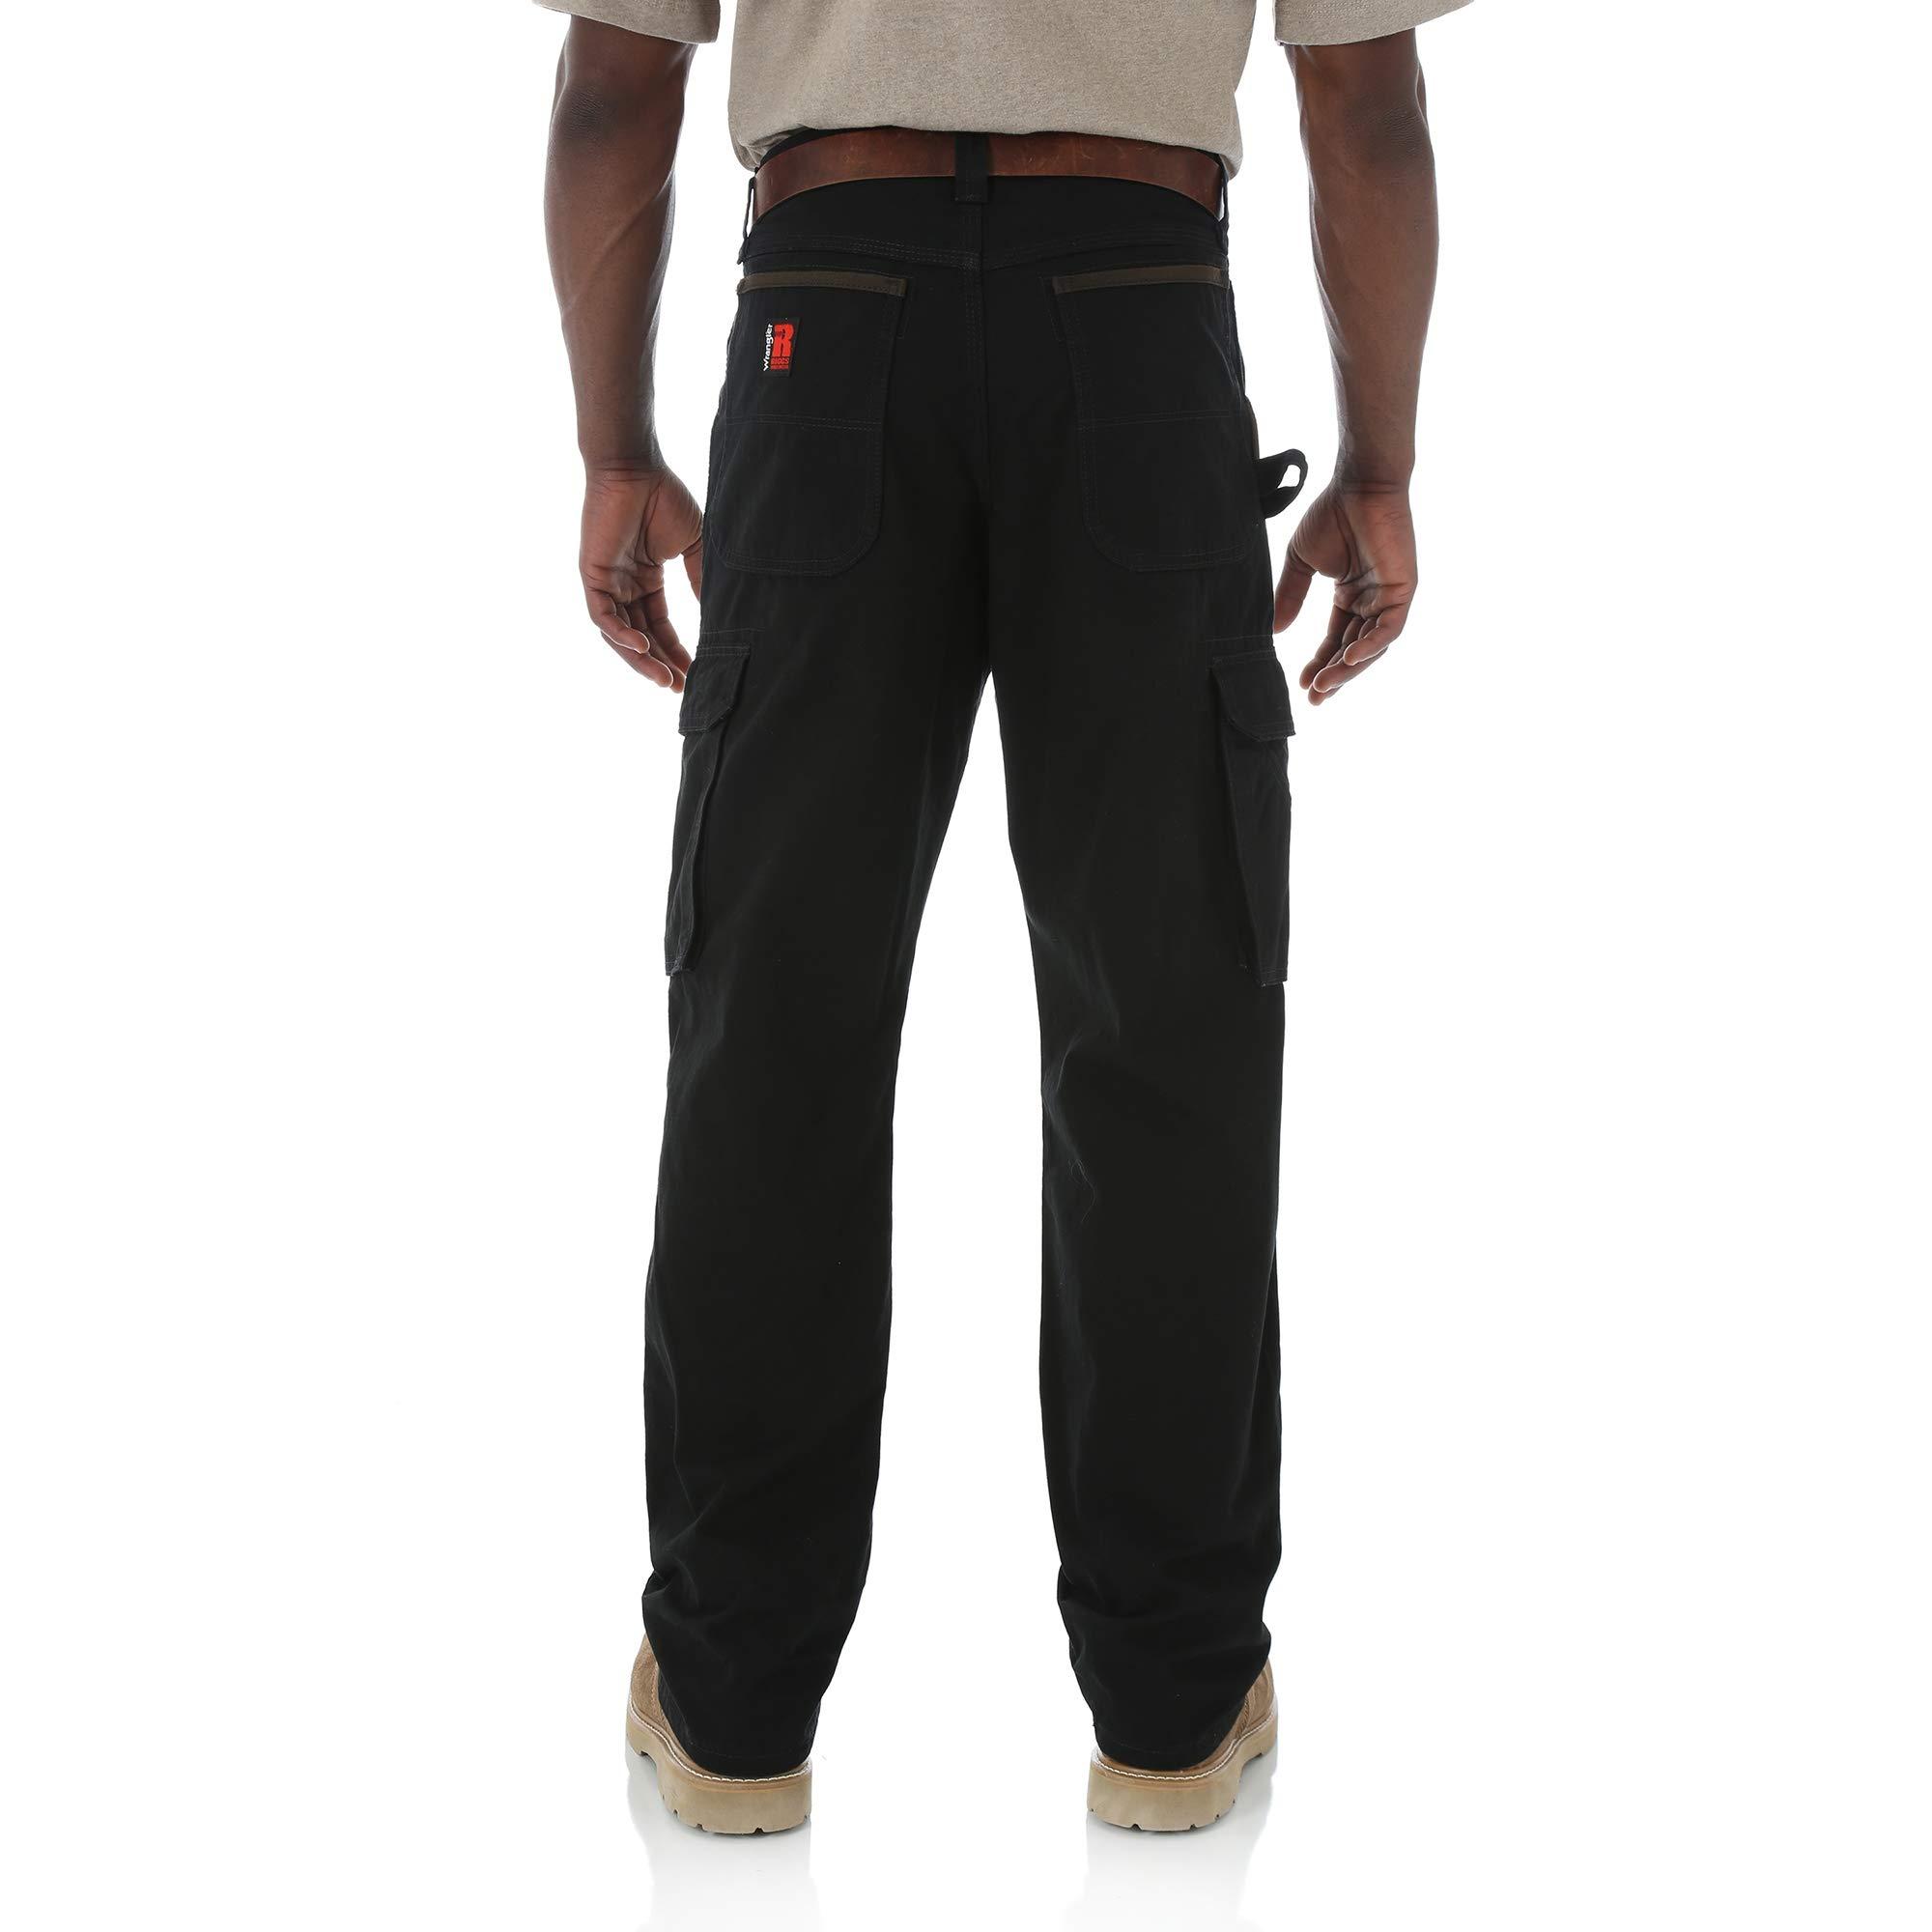 Riggs Workwear by Wrangler Mens Ranger Pant,Navy,30x34